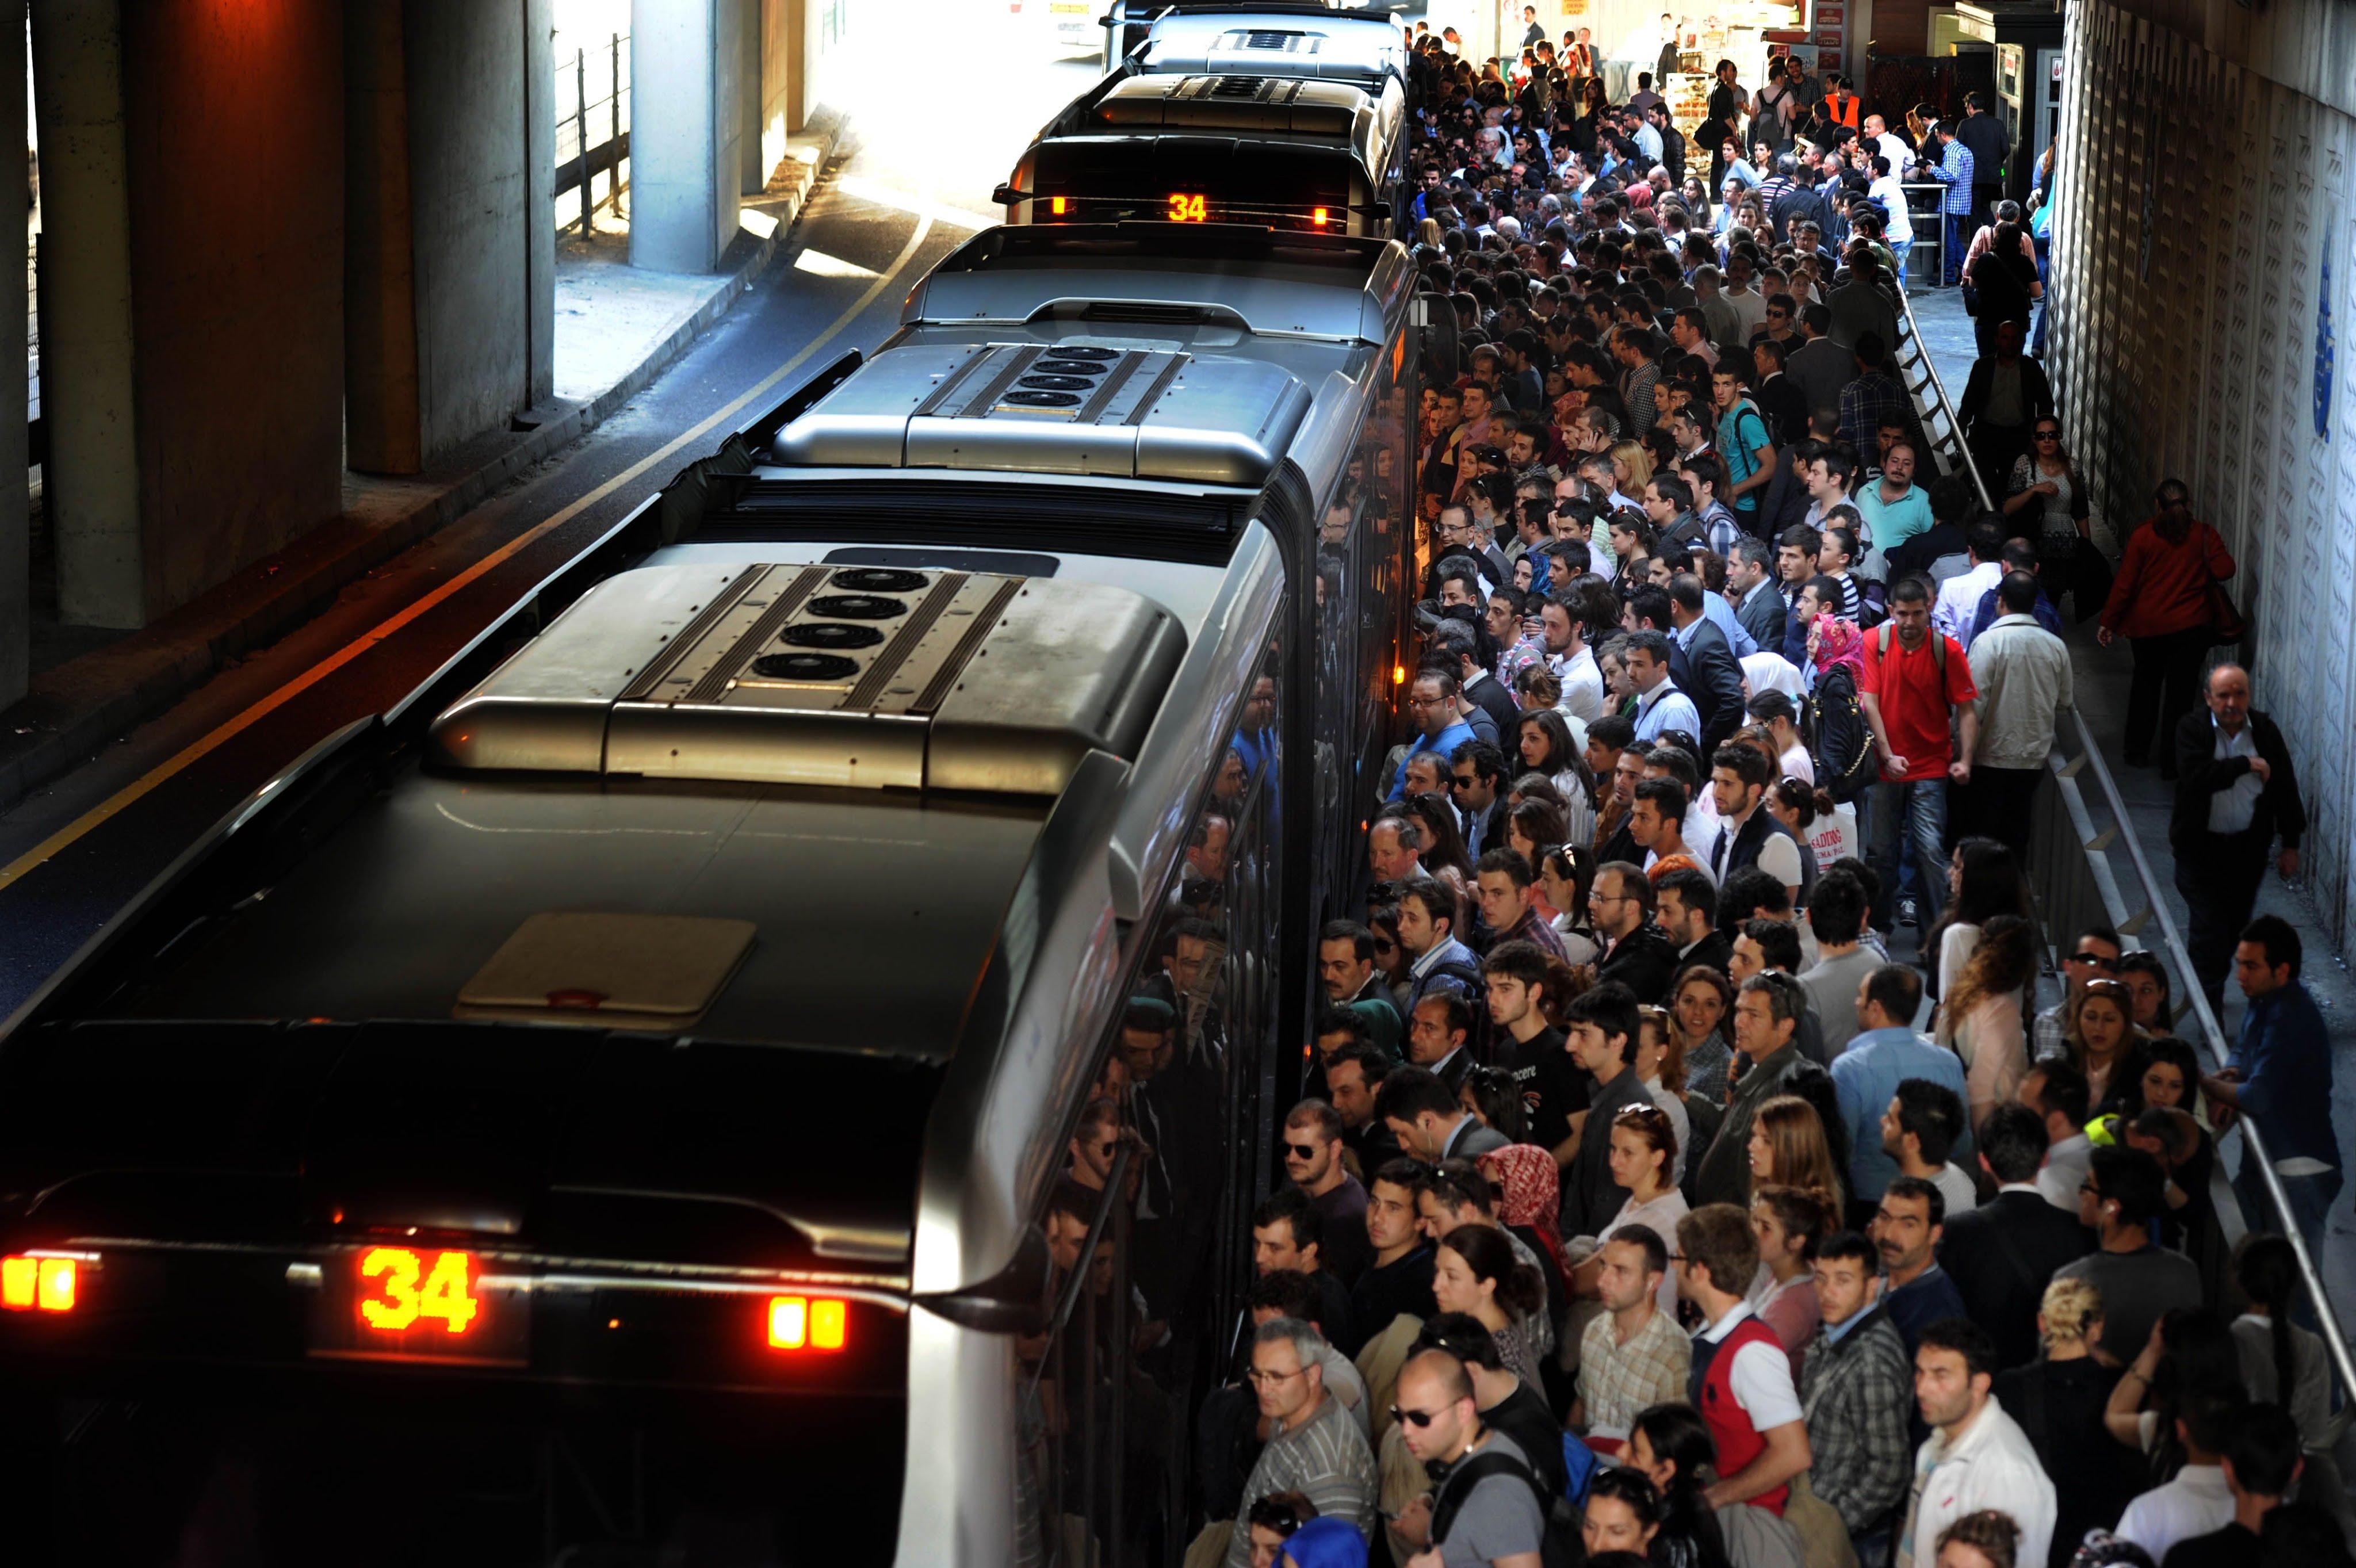 İstanbul Metrobüs Hattı